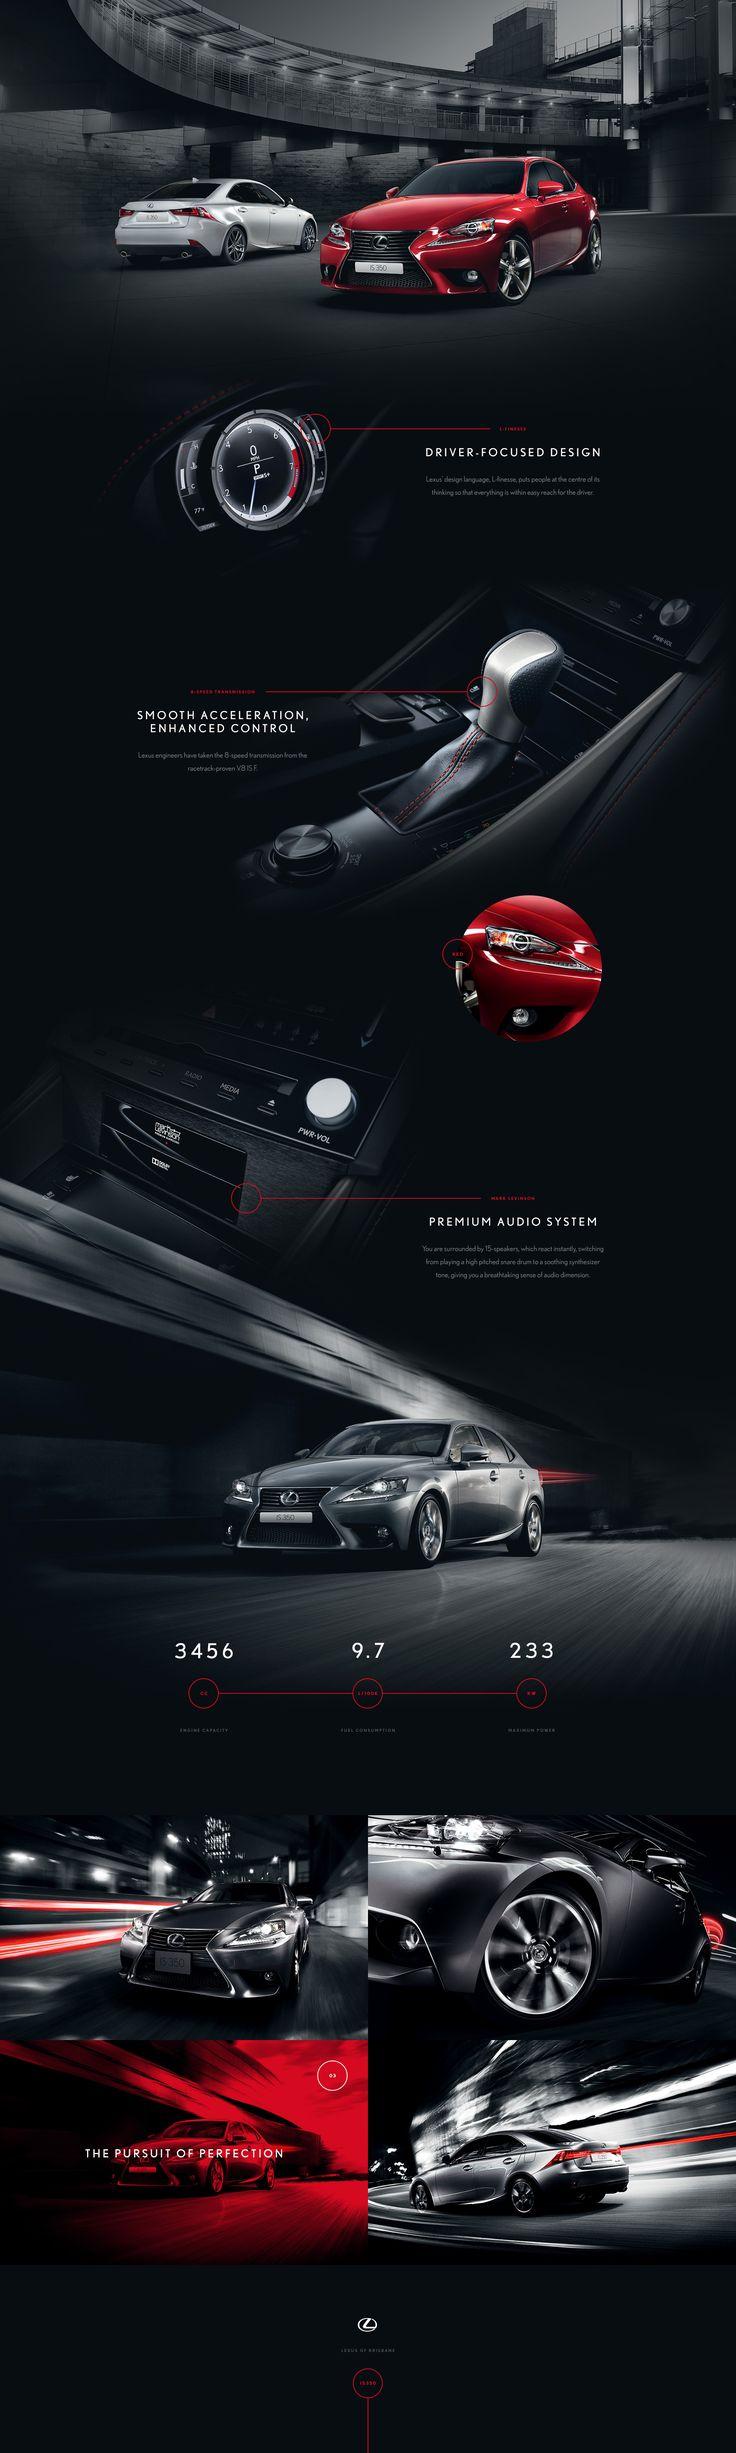 Lexus of Brisbane | Twofold Graphic & Web Design